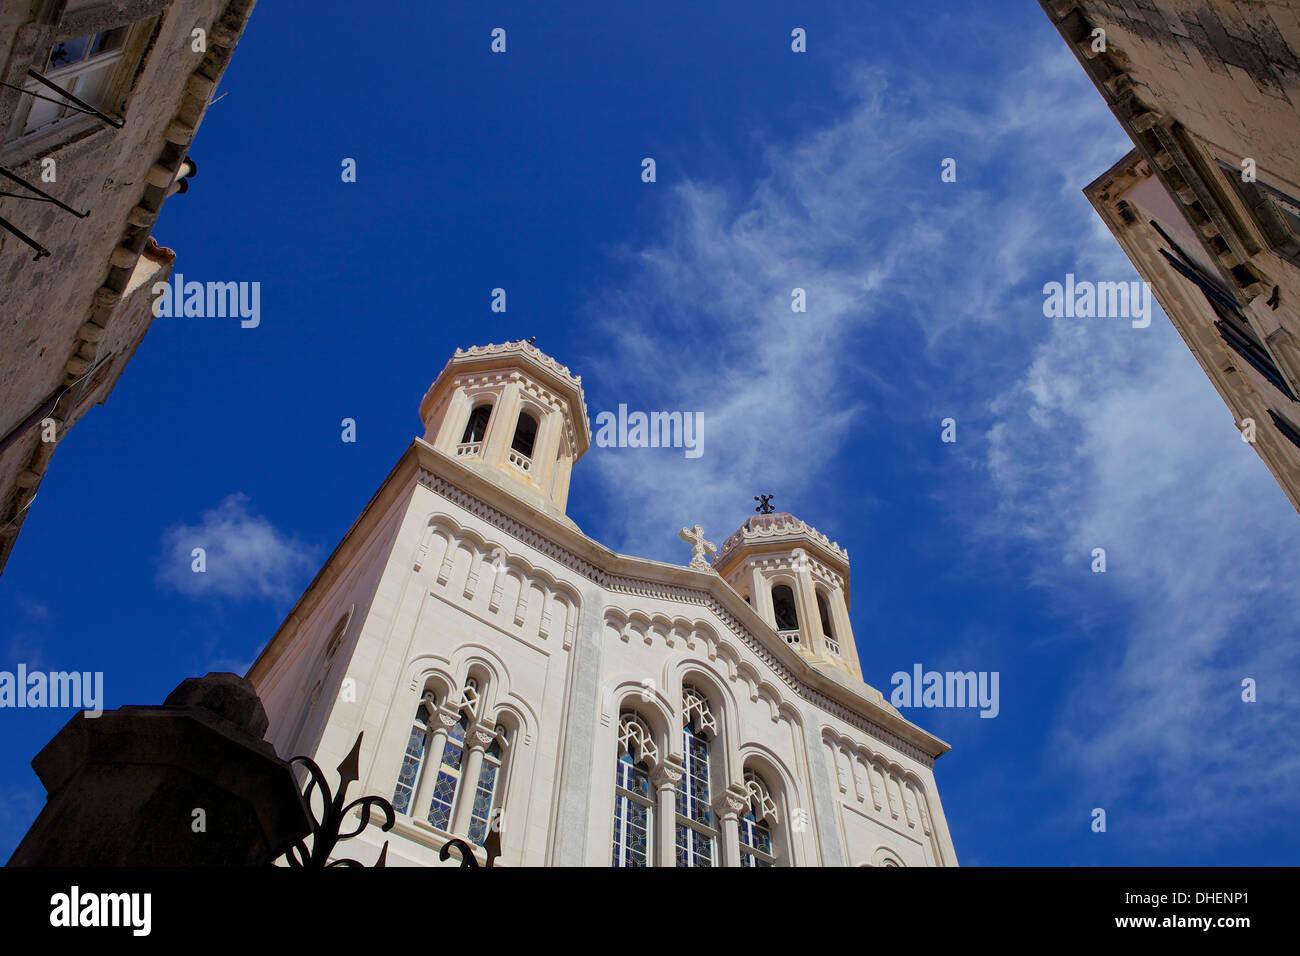 Serbian Orthodox church, Old Town Dubrovnik, Croatia, Europe - Stock Image